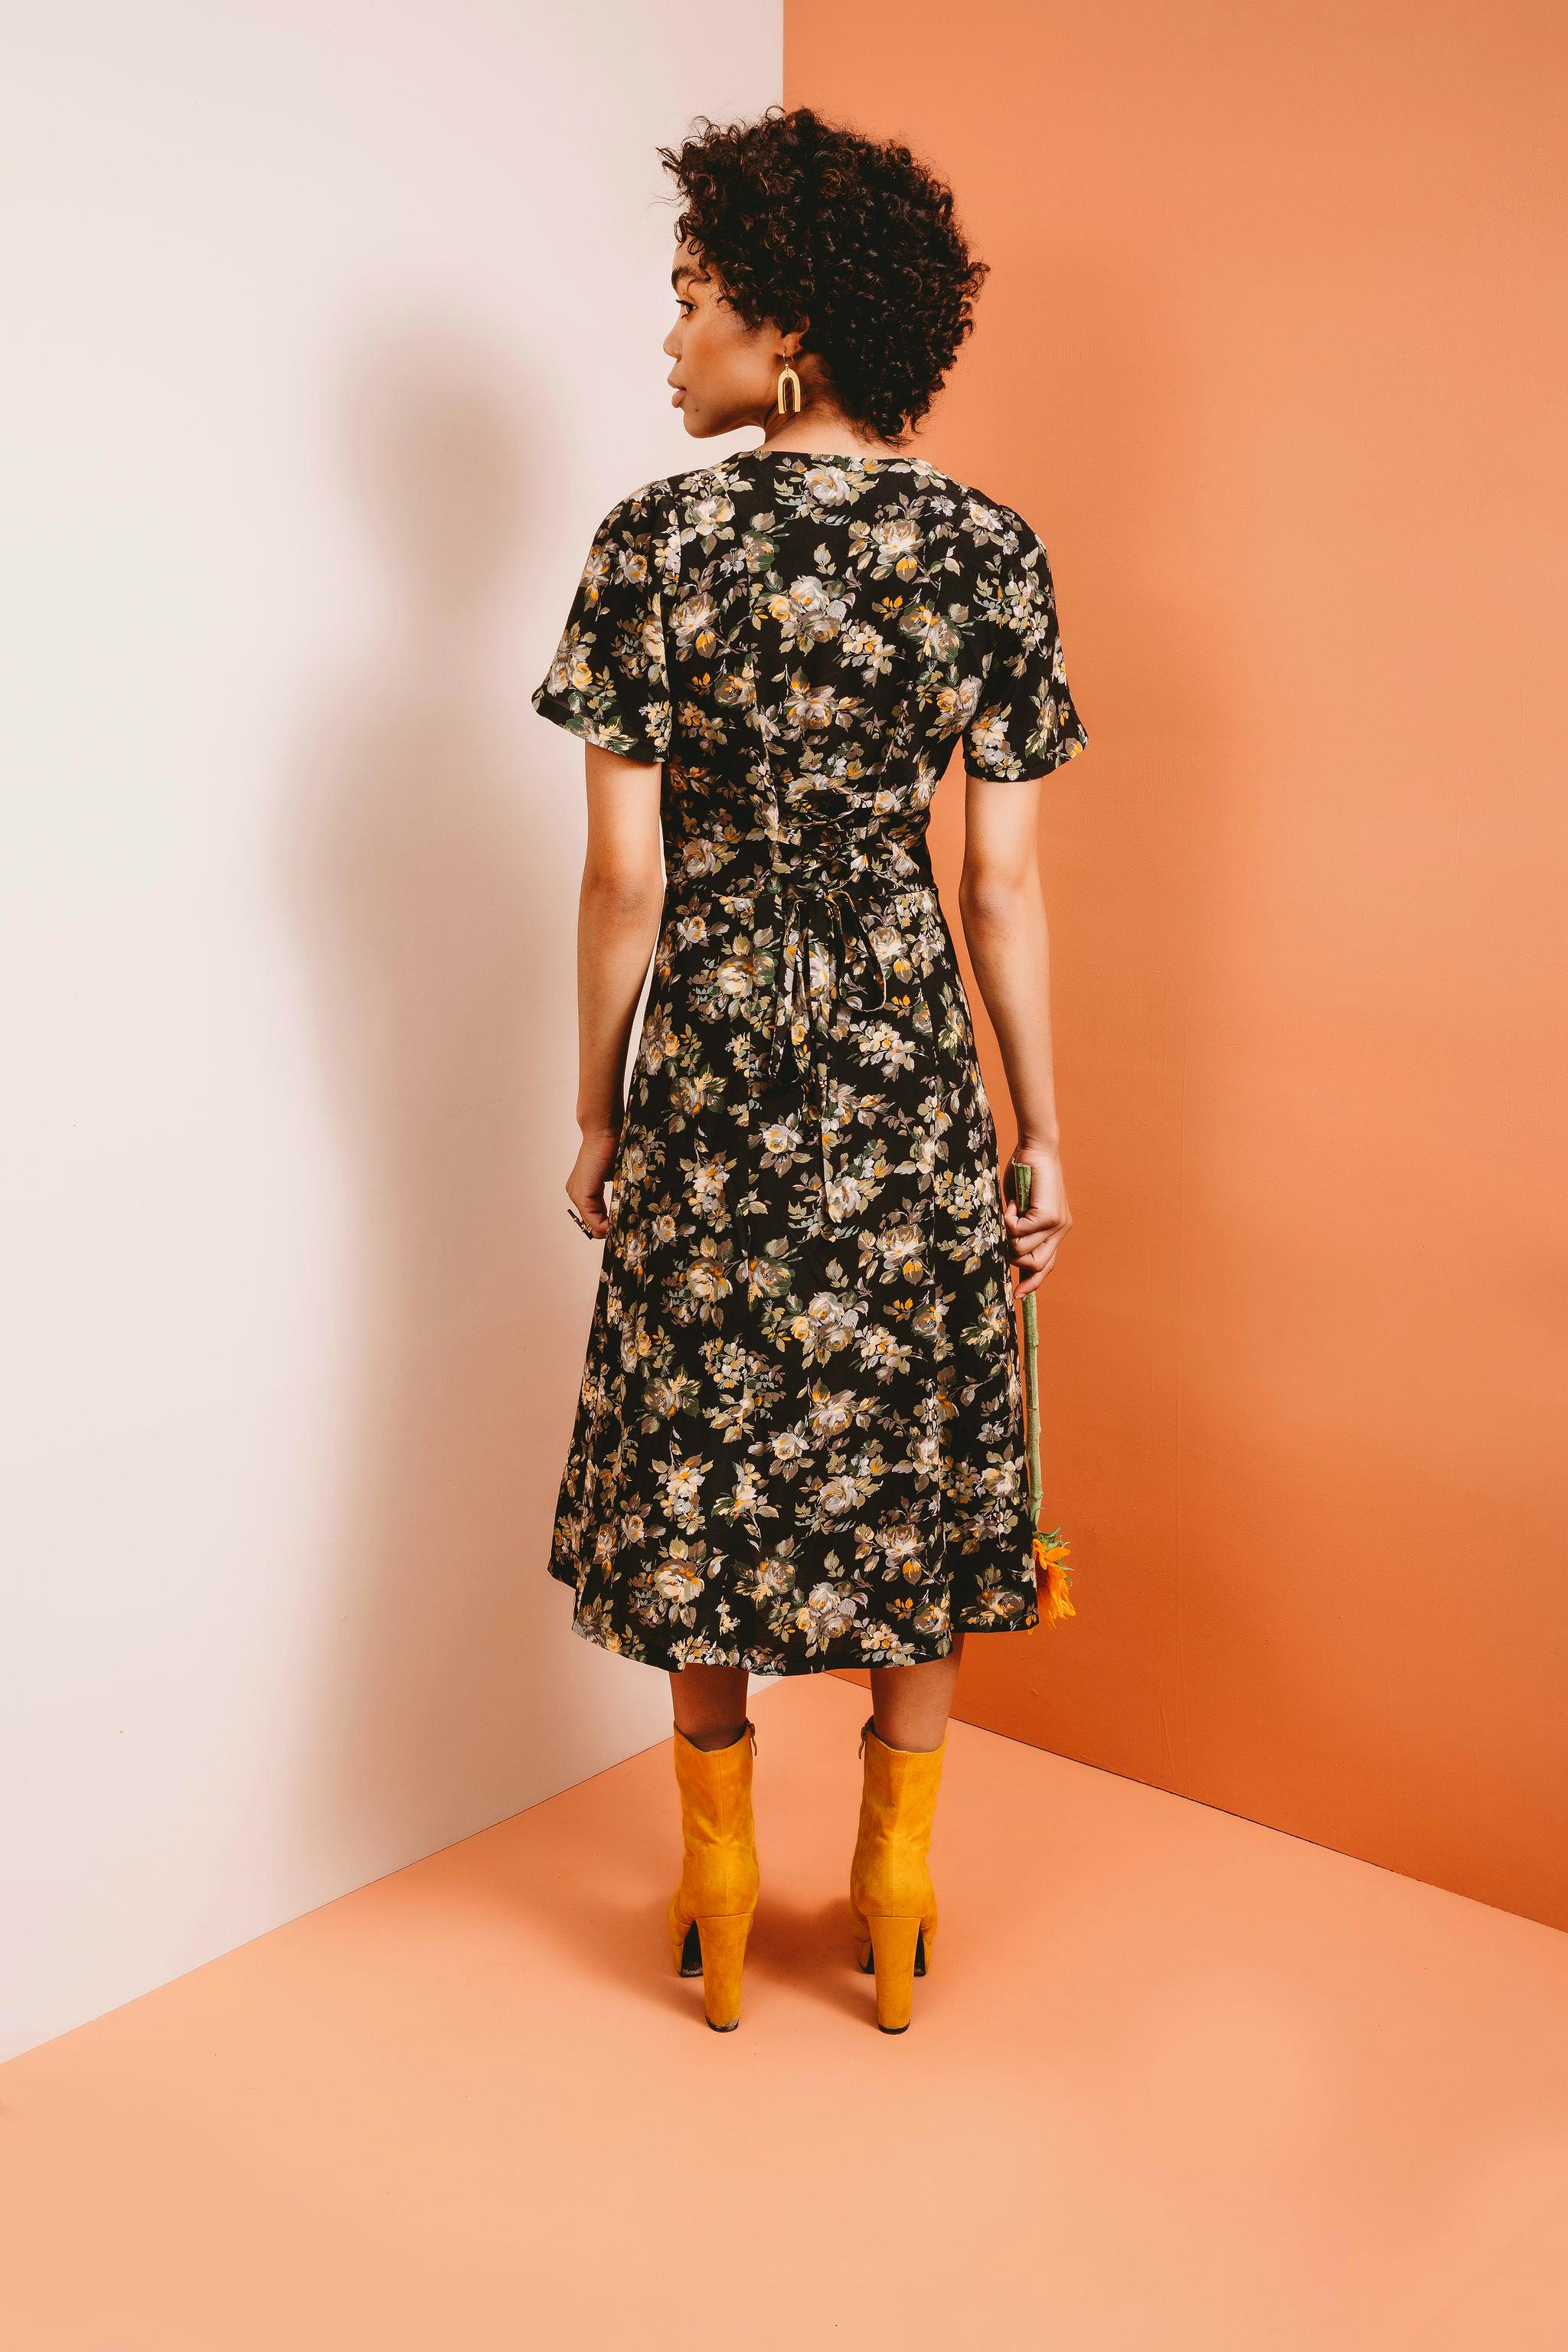 Hughes Dress Sewing Pattern - Friday Pattern Co - 11.jpg